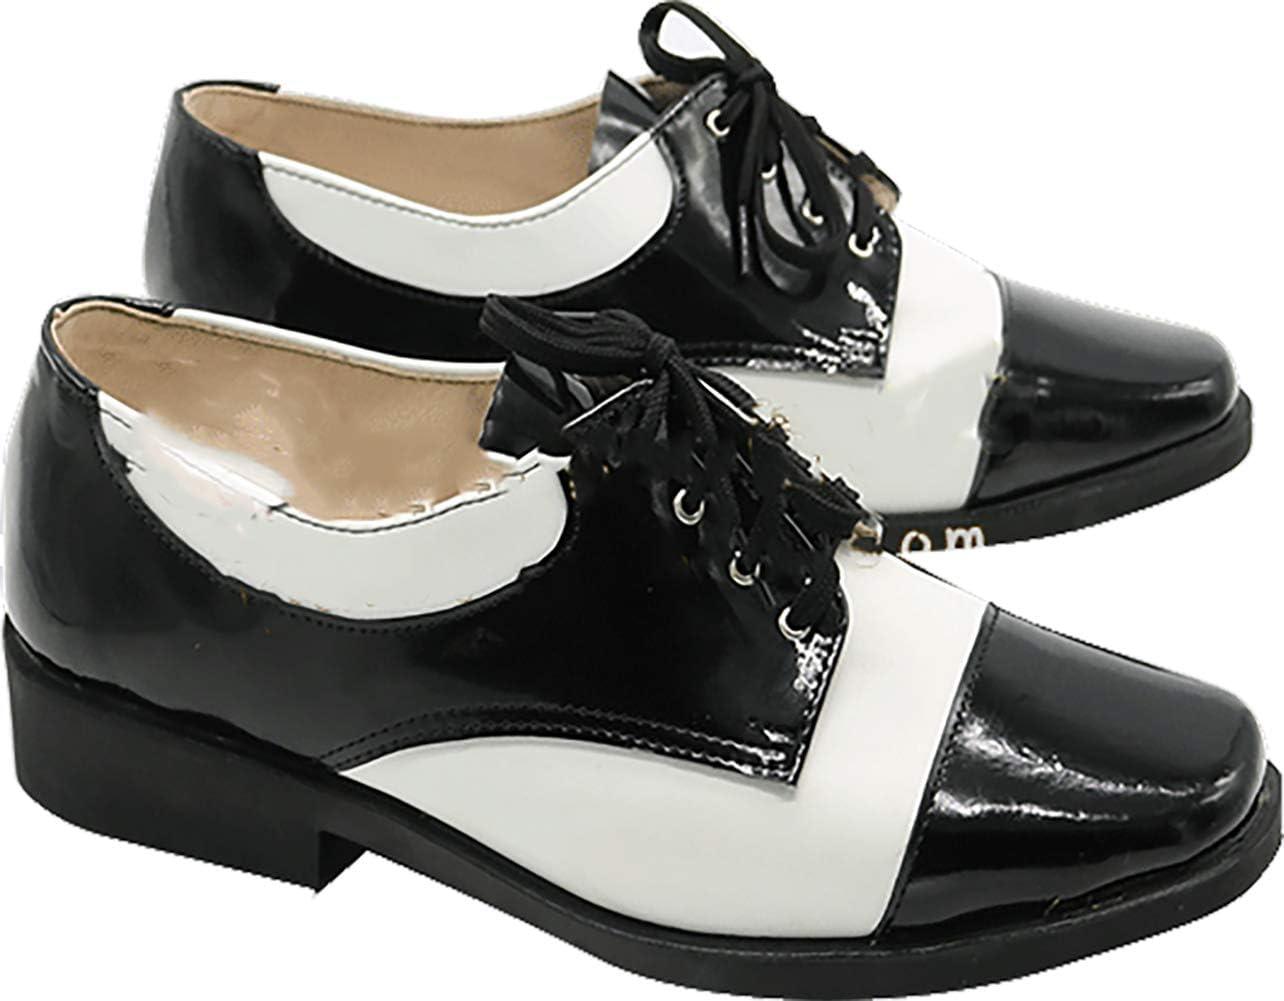 Joker Batman shoes